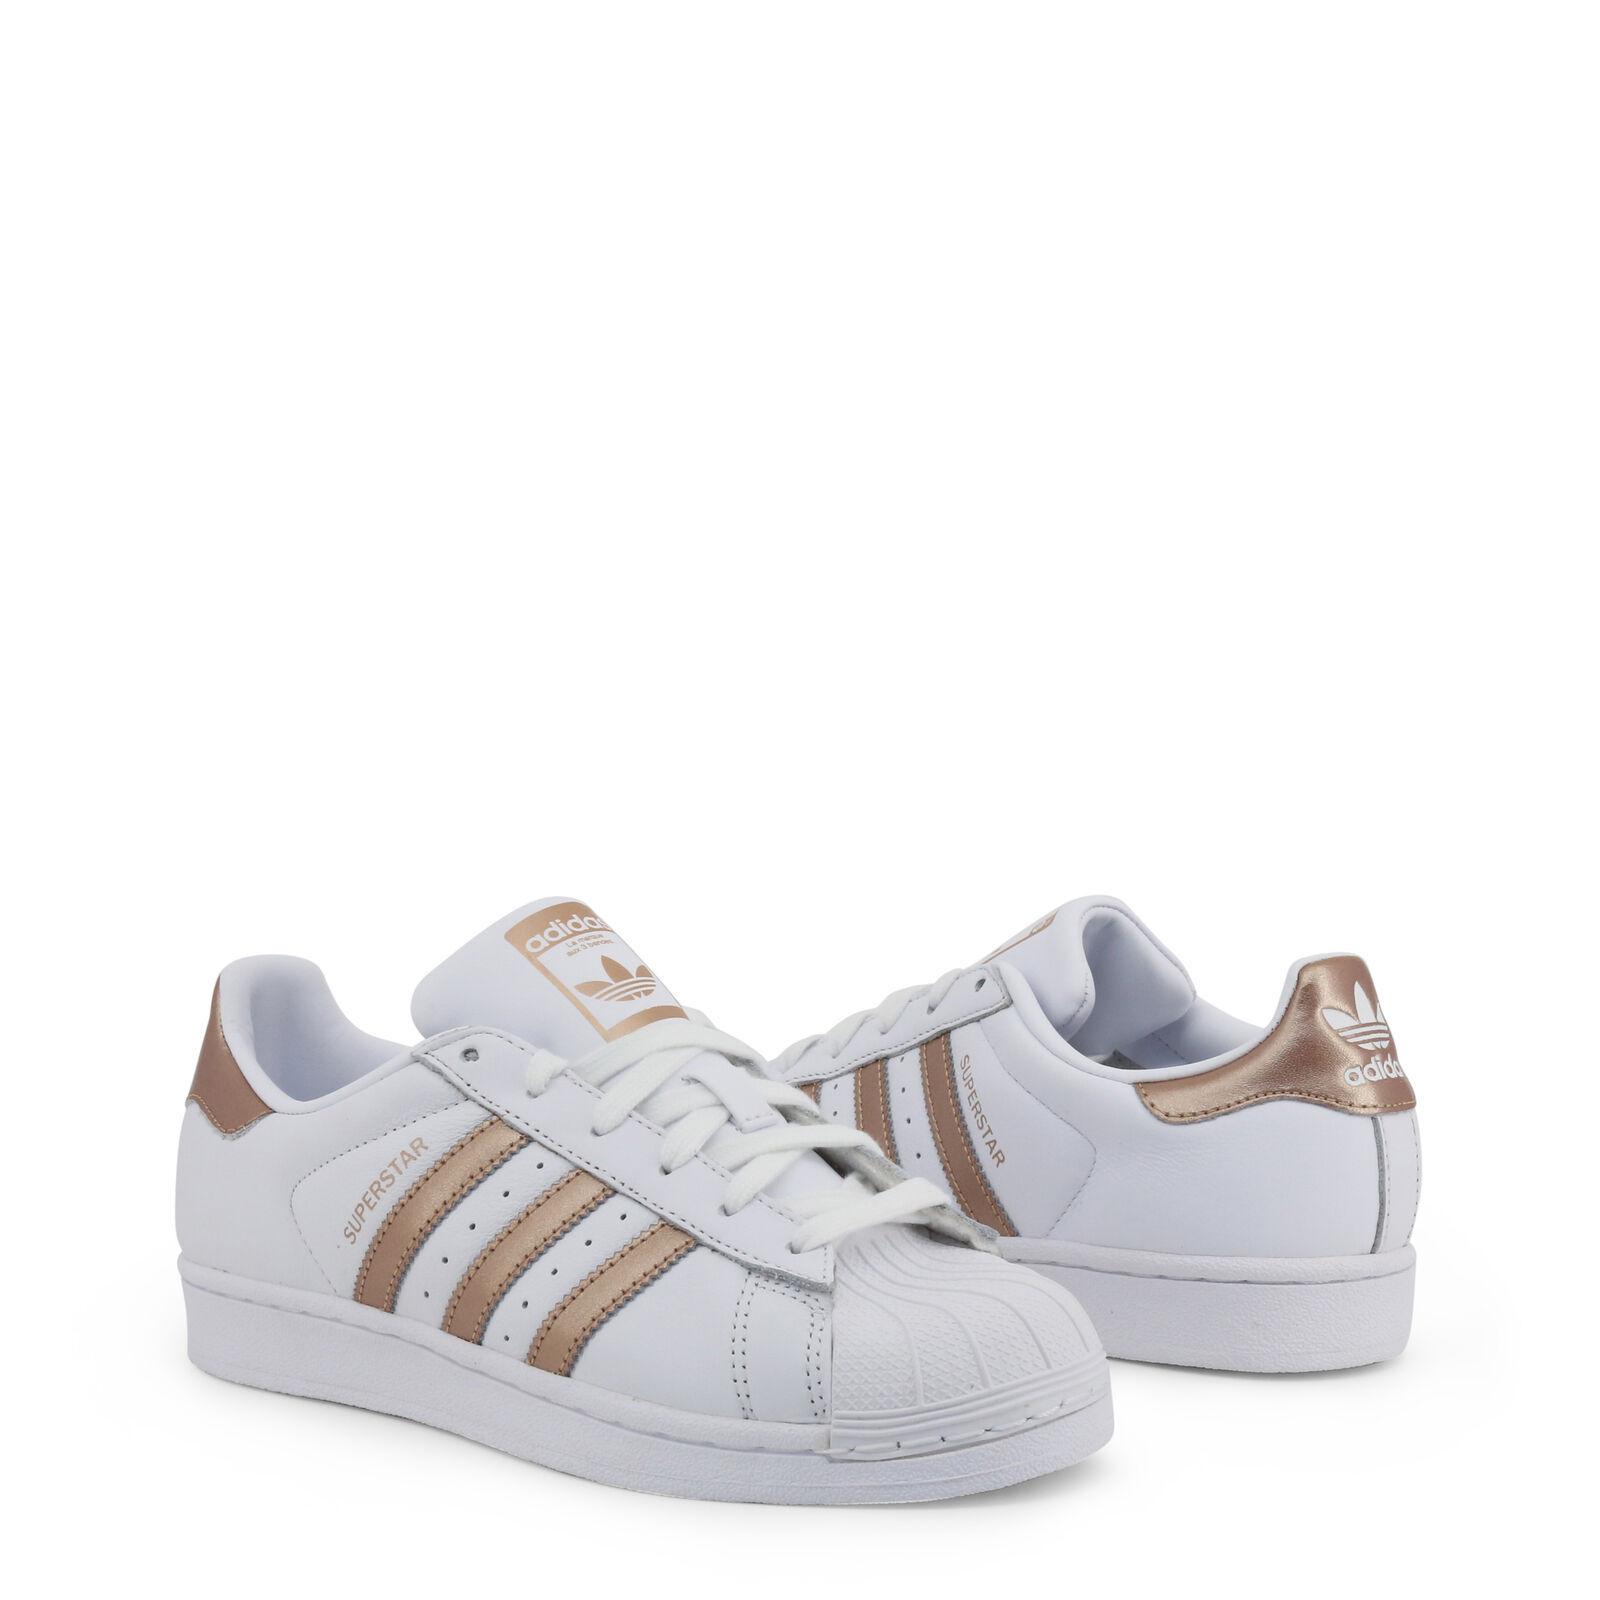 Adidas Superestrella Unisex Blanco 102615